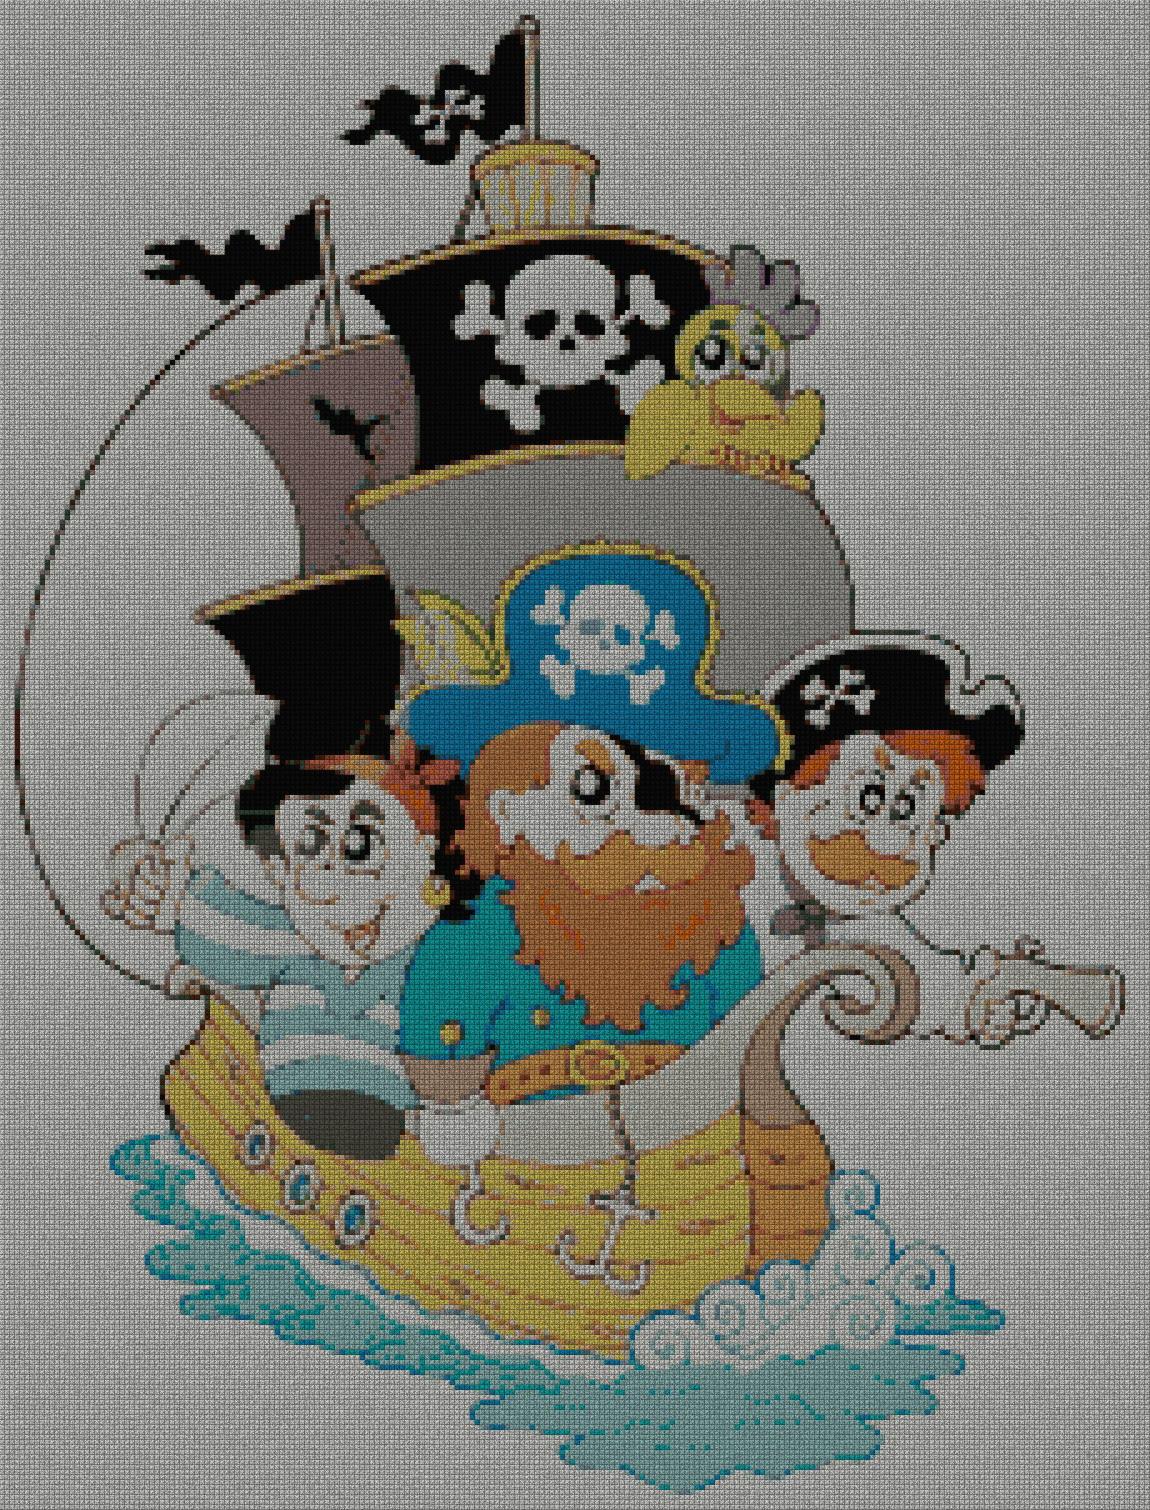 schemi_misti/misti/pirati_s.jpg